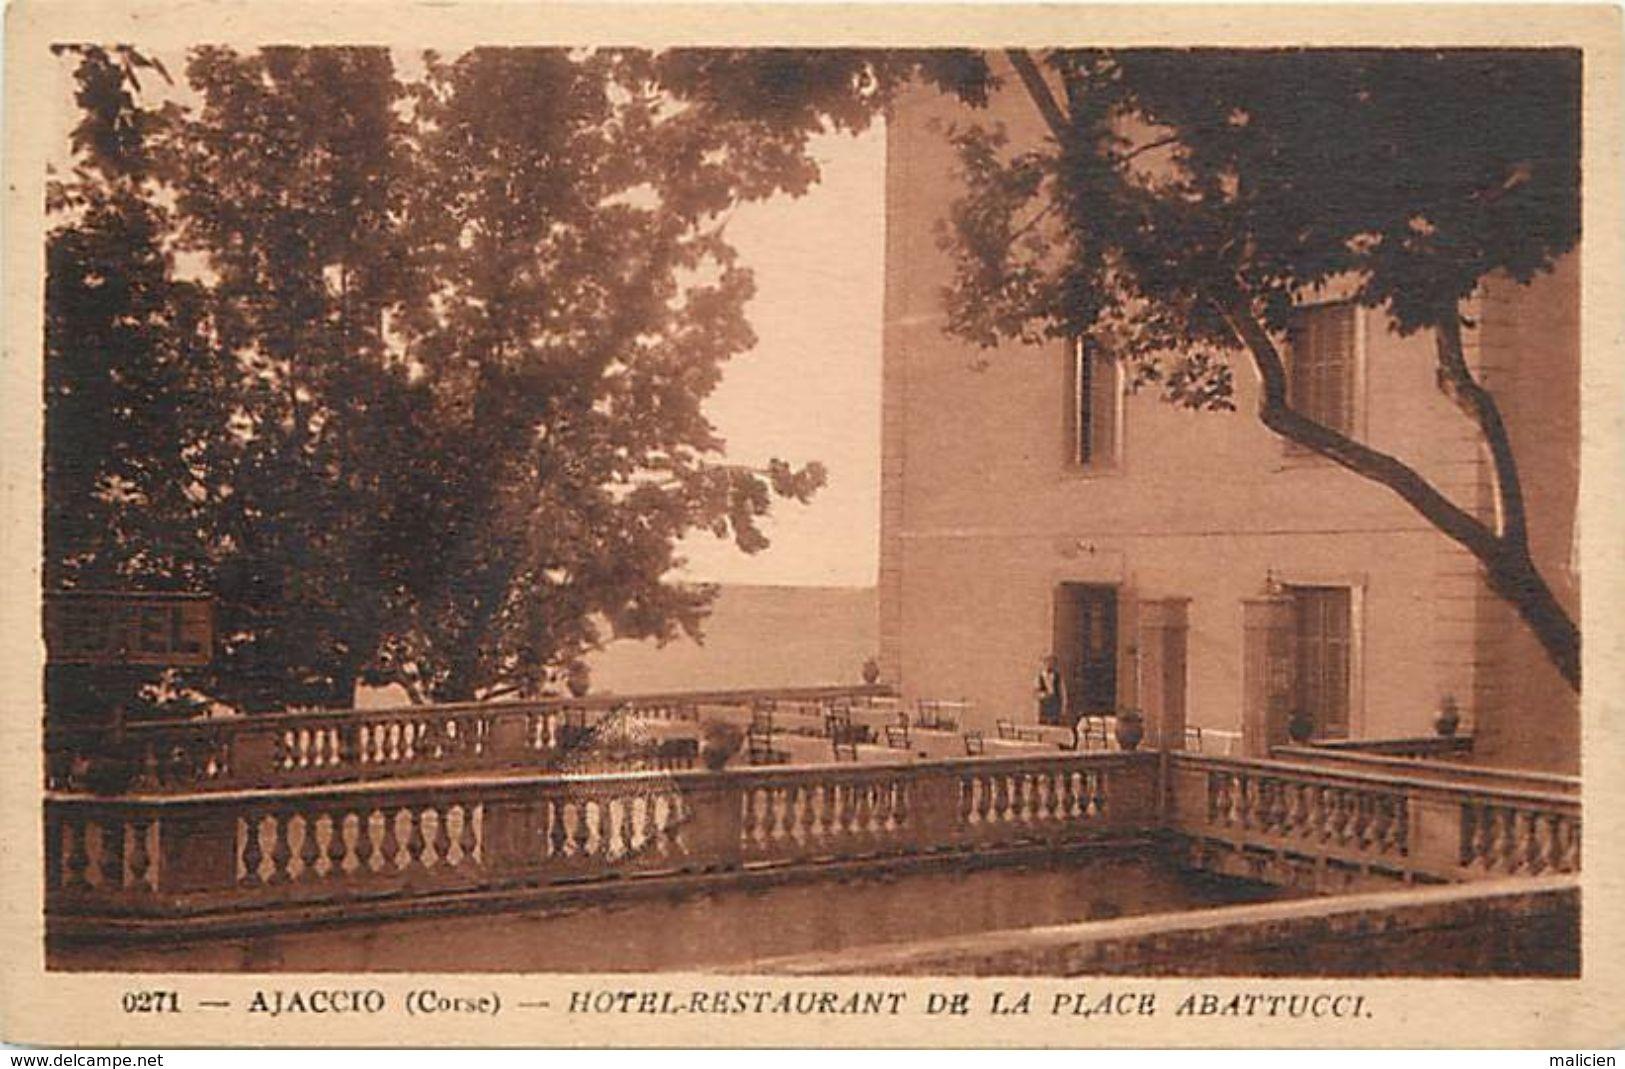 - Dpts Div.-ref-UU986- Corse Du Sud - Ajaccio - Terrasse Hotel Restaurant De La Place Abattuci - S. Panero Propr. - - Ajaccio